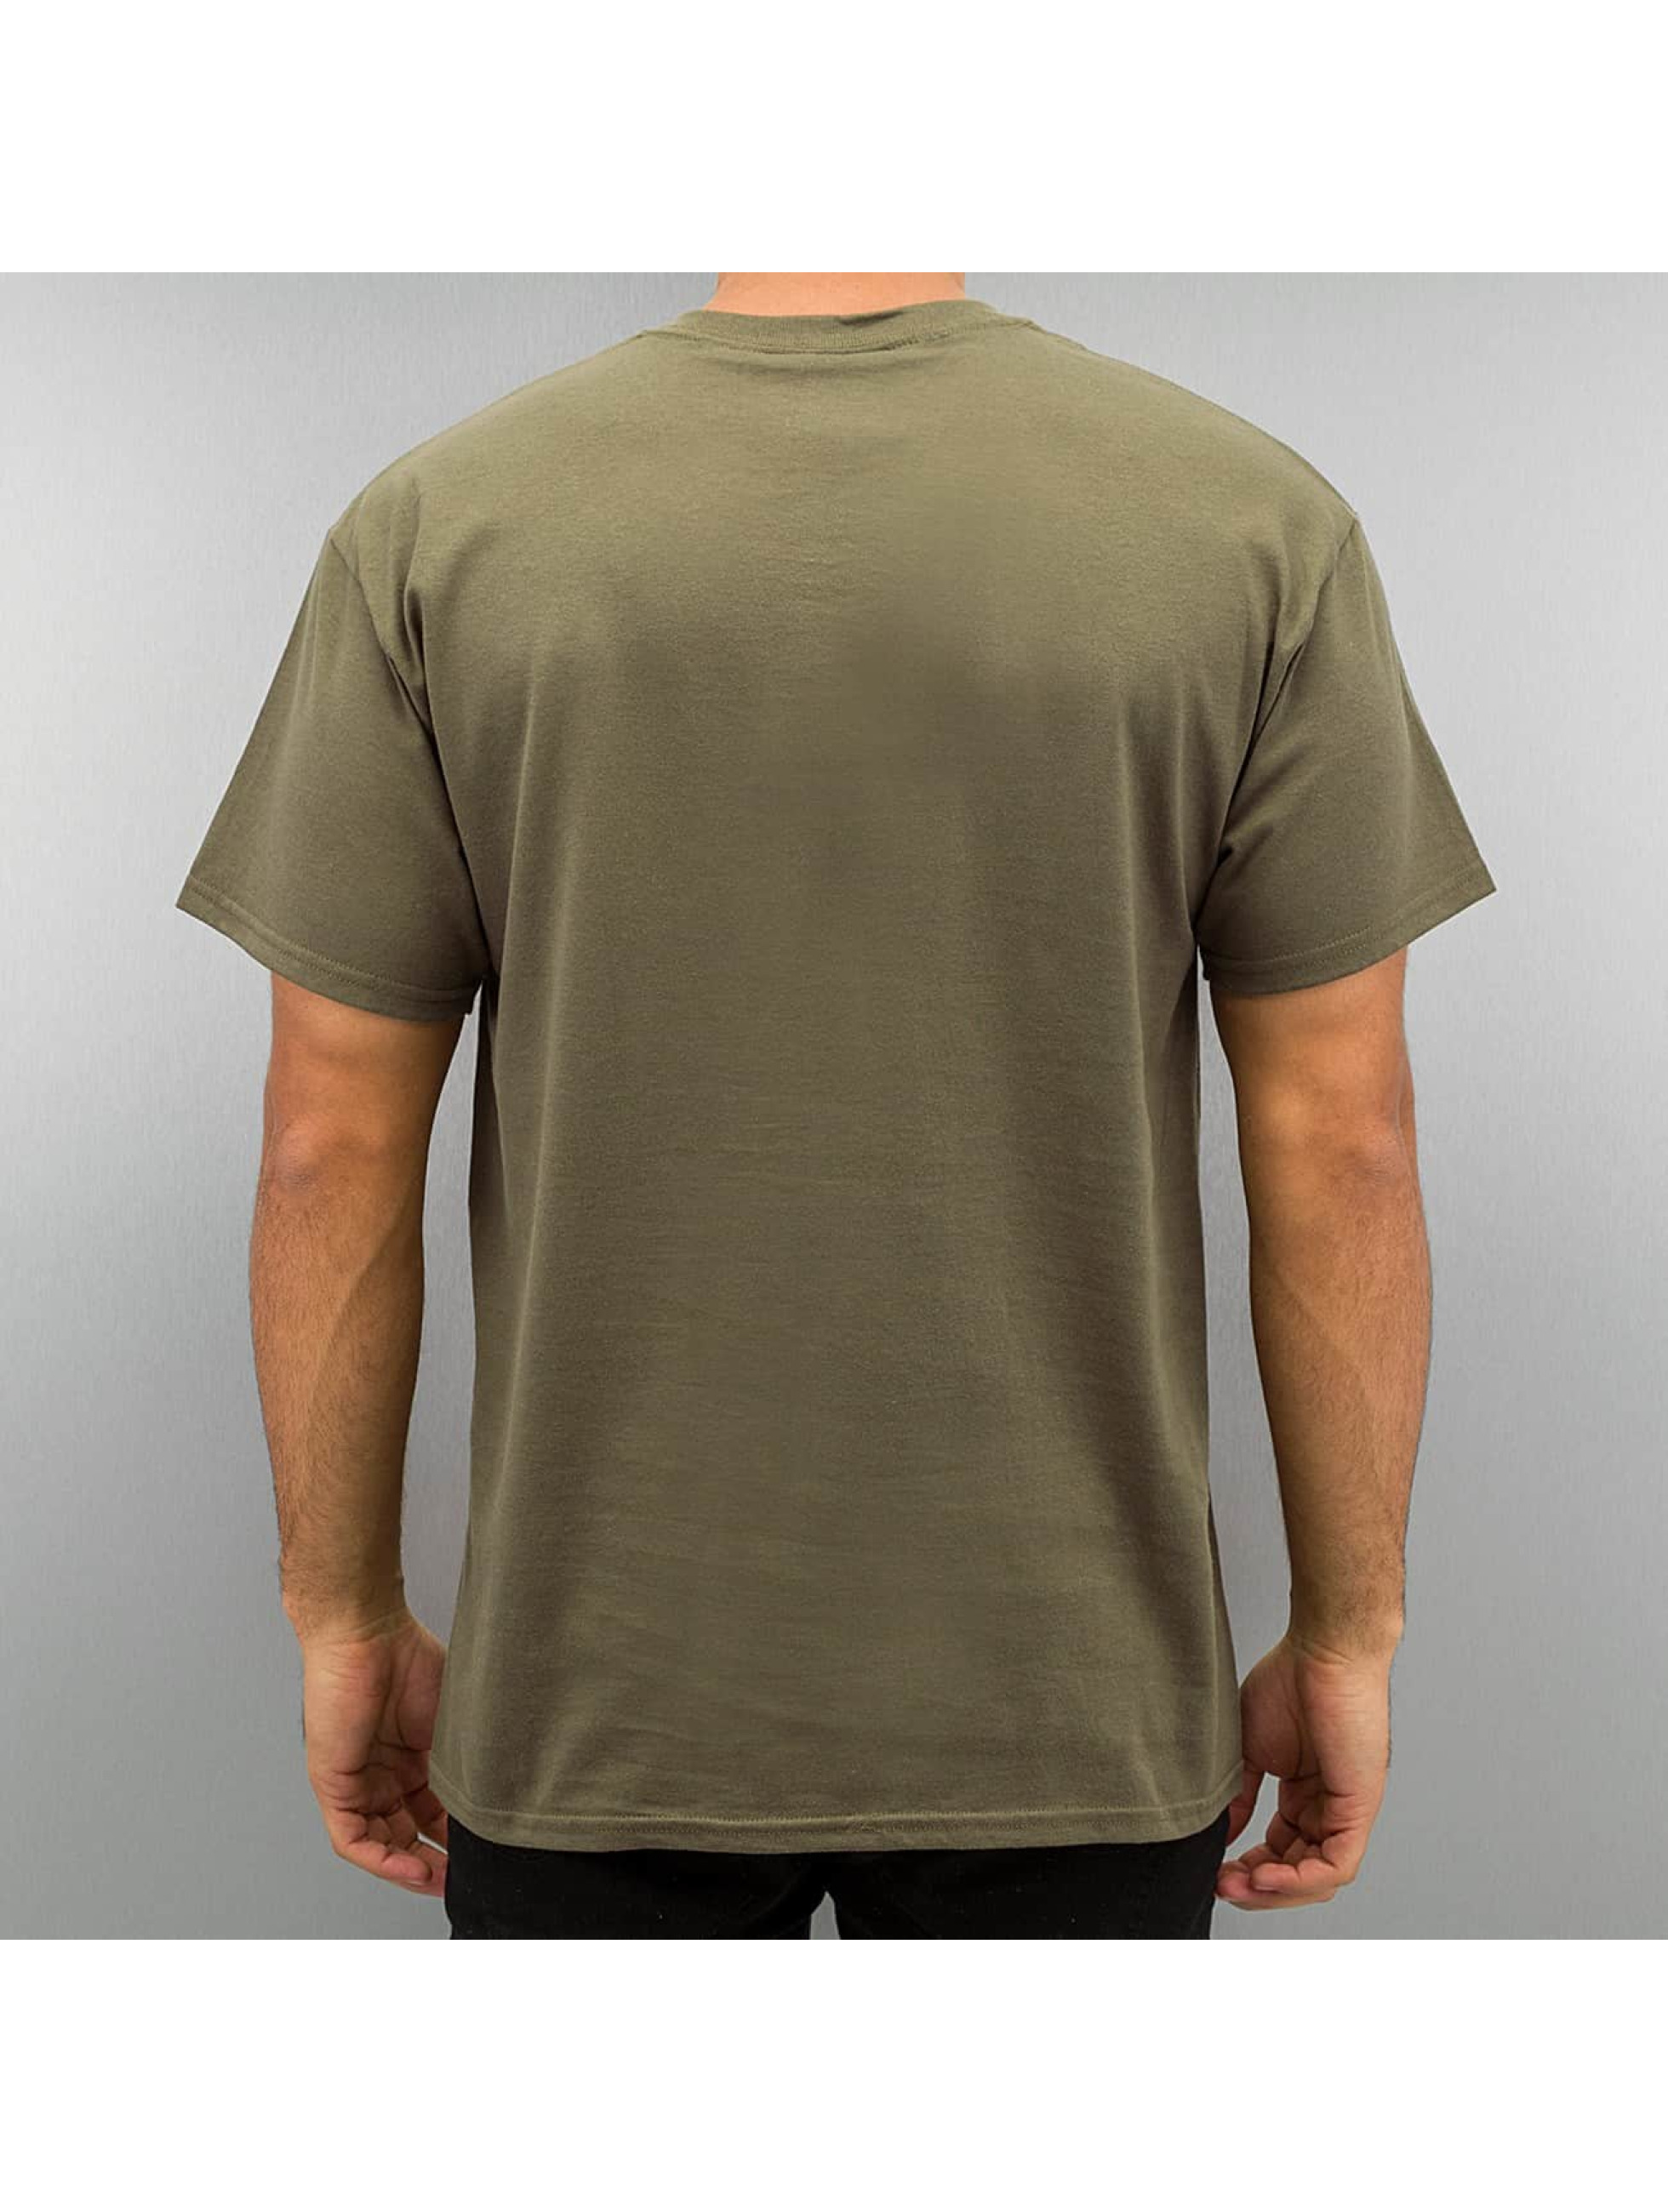 Joker t-shirt Scandalos olijfgroen